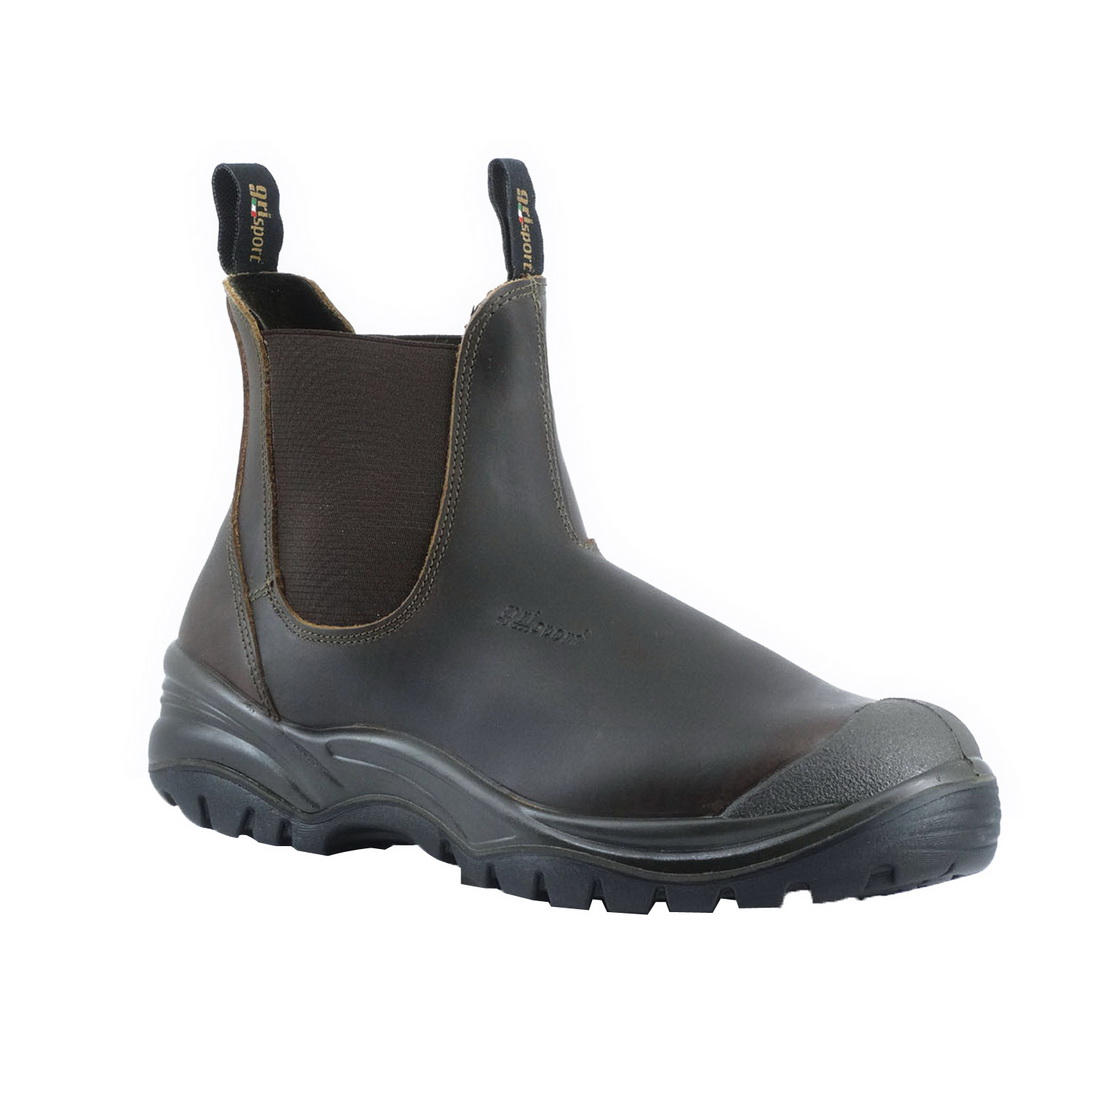 Genoa Safety Slip On Safety Boot Size 11 Brown Dakar Leather